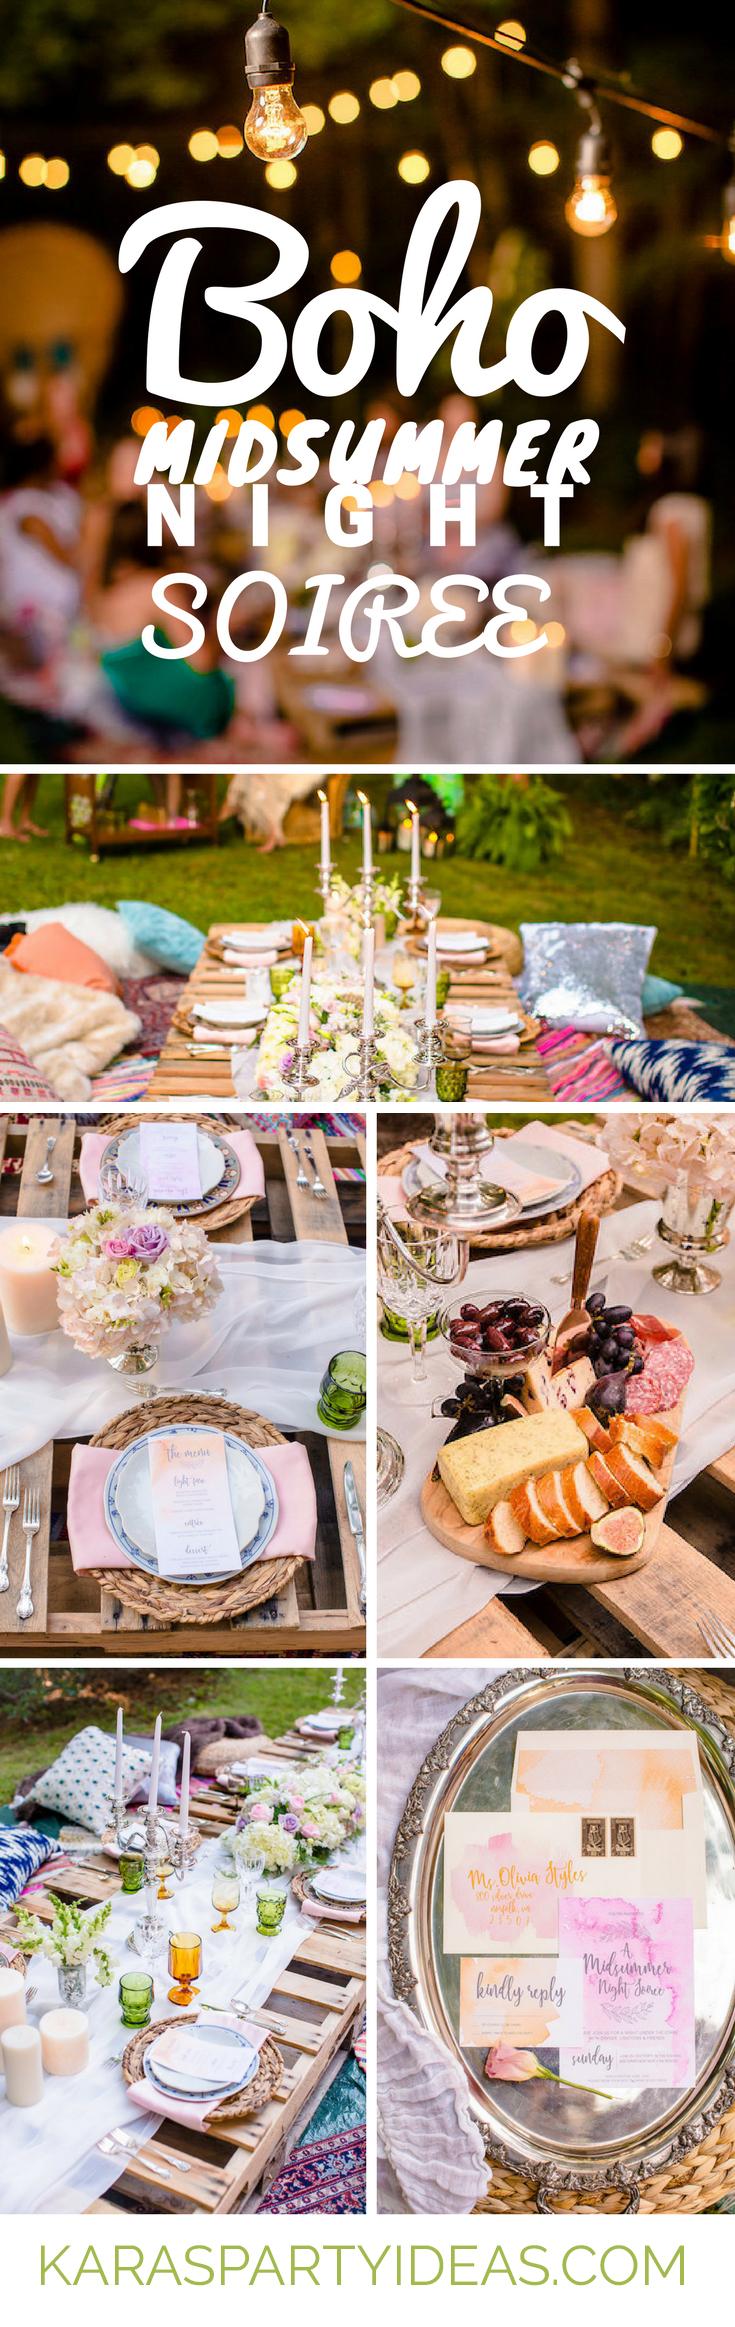 Boho Midsummer Night Soiree via Kara's Party Ideas - KarasPartyIdeas.com